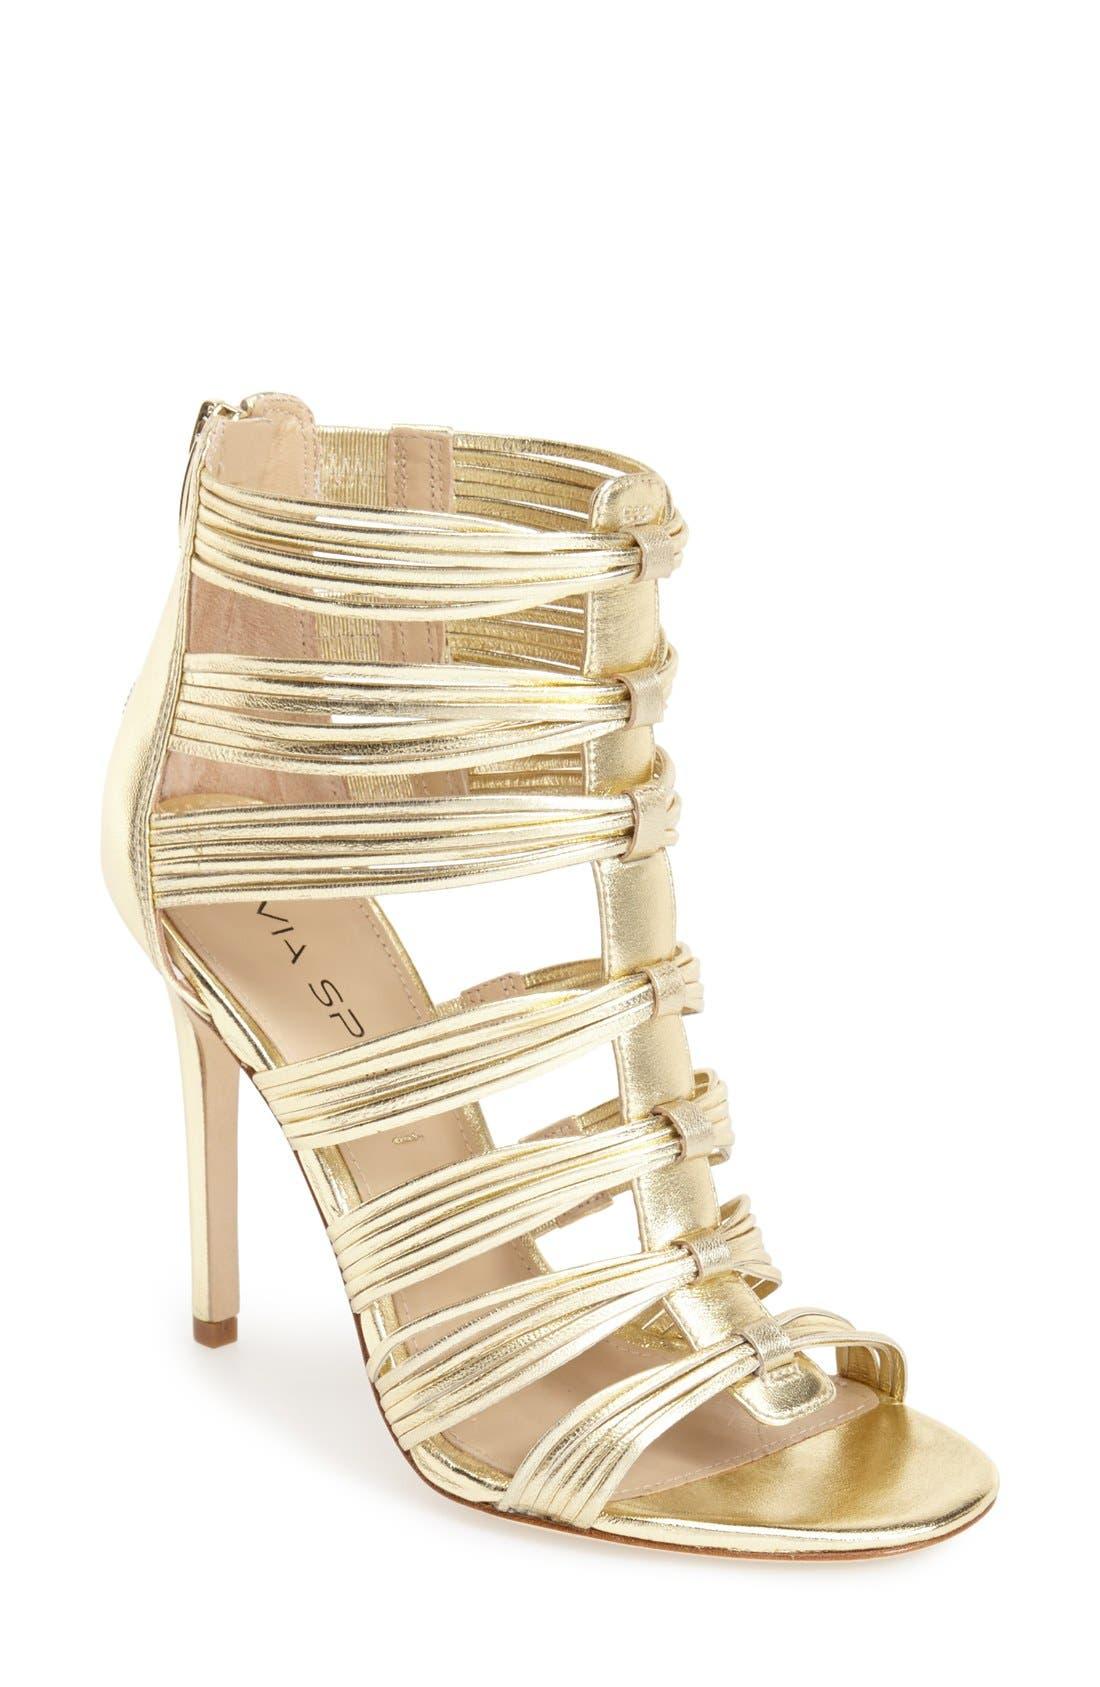 Main Image - Via Spiga 'Terelle' Open Toe Cage Leather Sandal (Women)